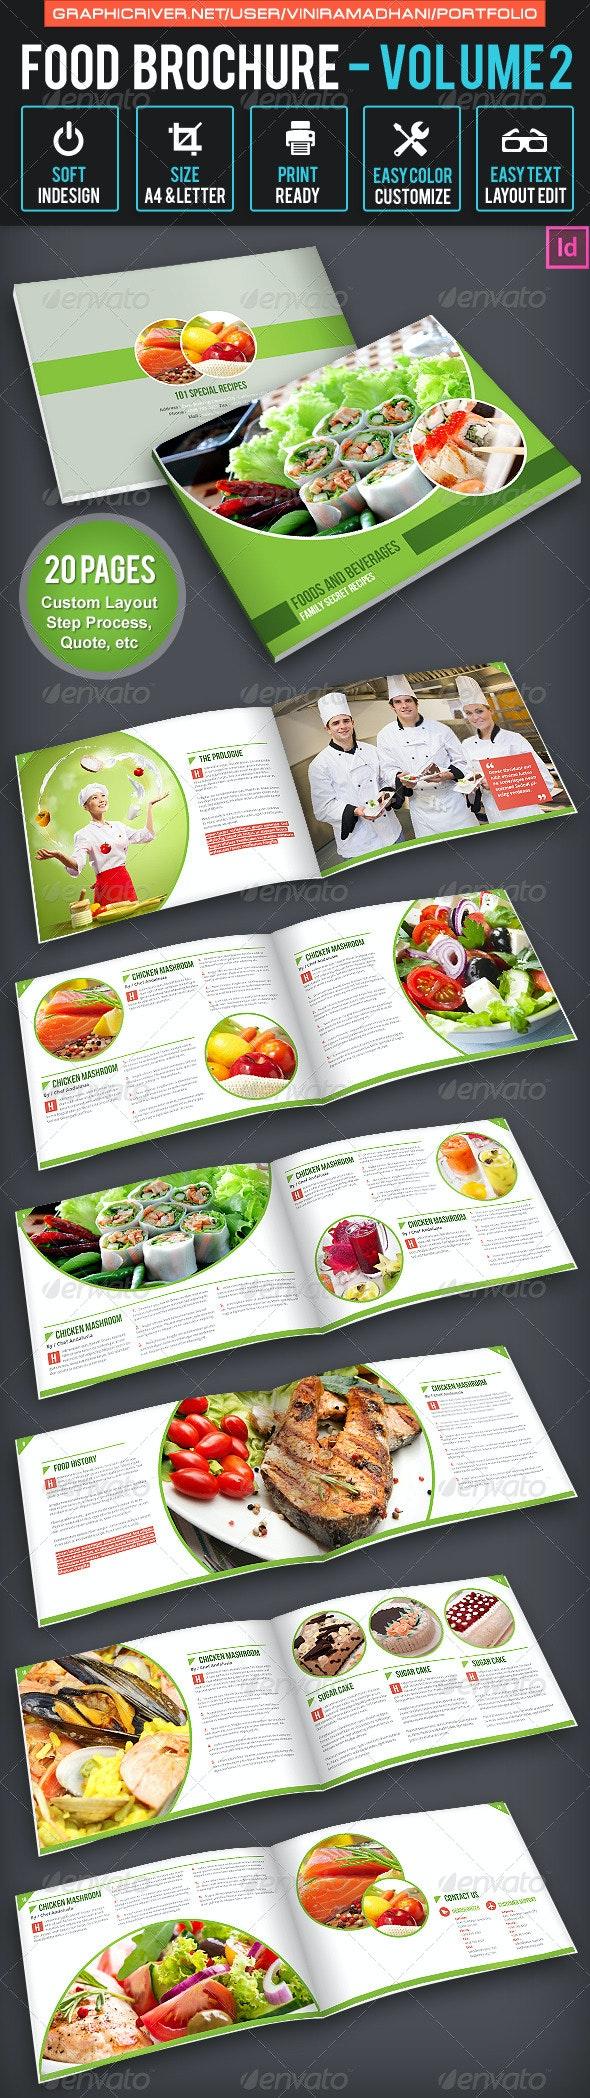 Food Brochure | Volume 2 - Portfolio Brochures